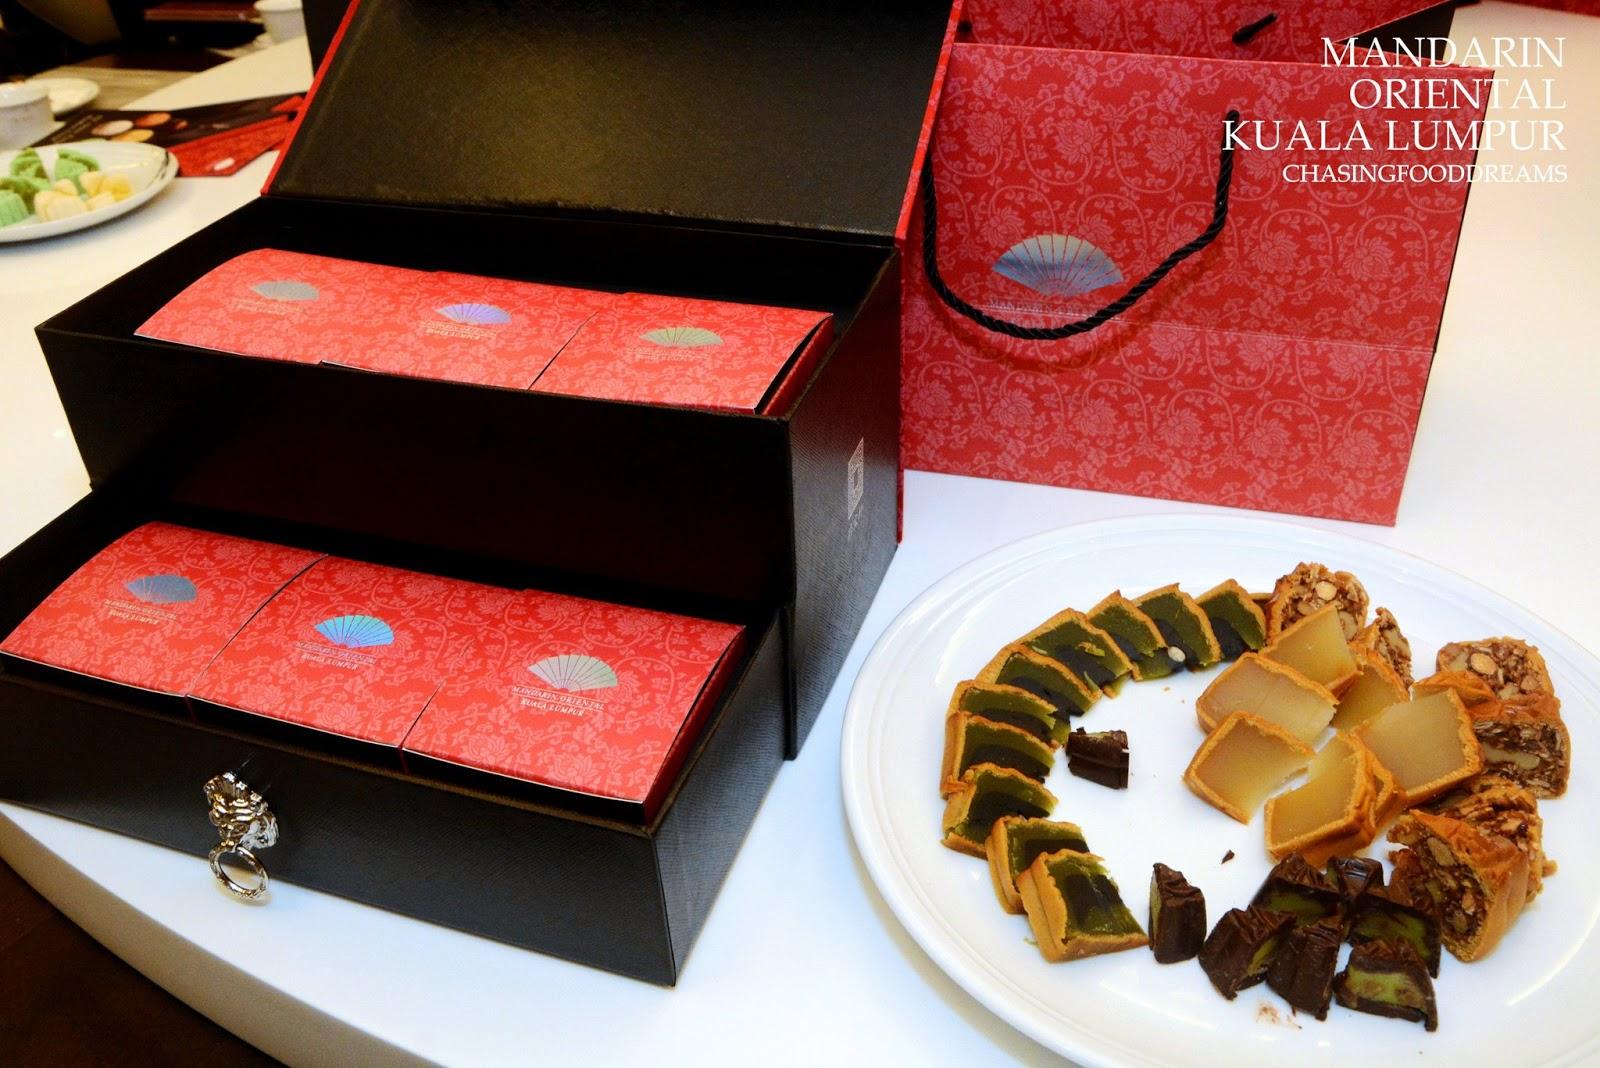 Chasing food dreams mandarin oriental kuala lumpur a for Canape orientale